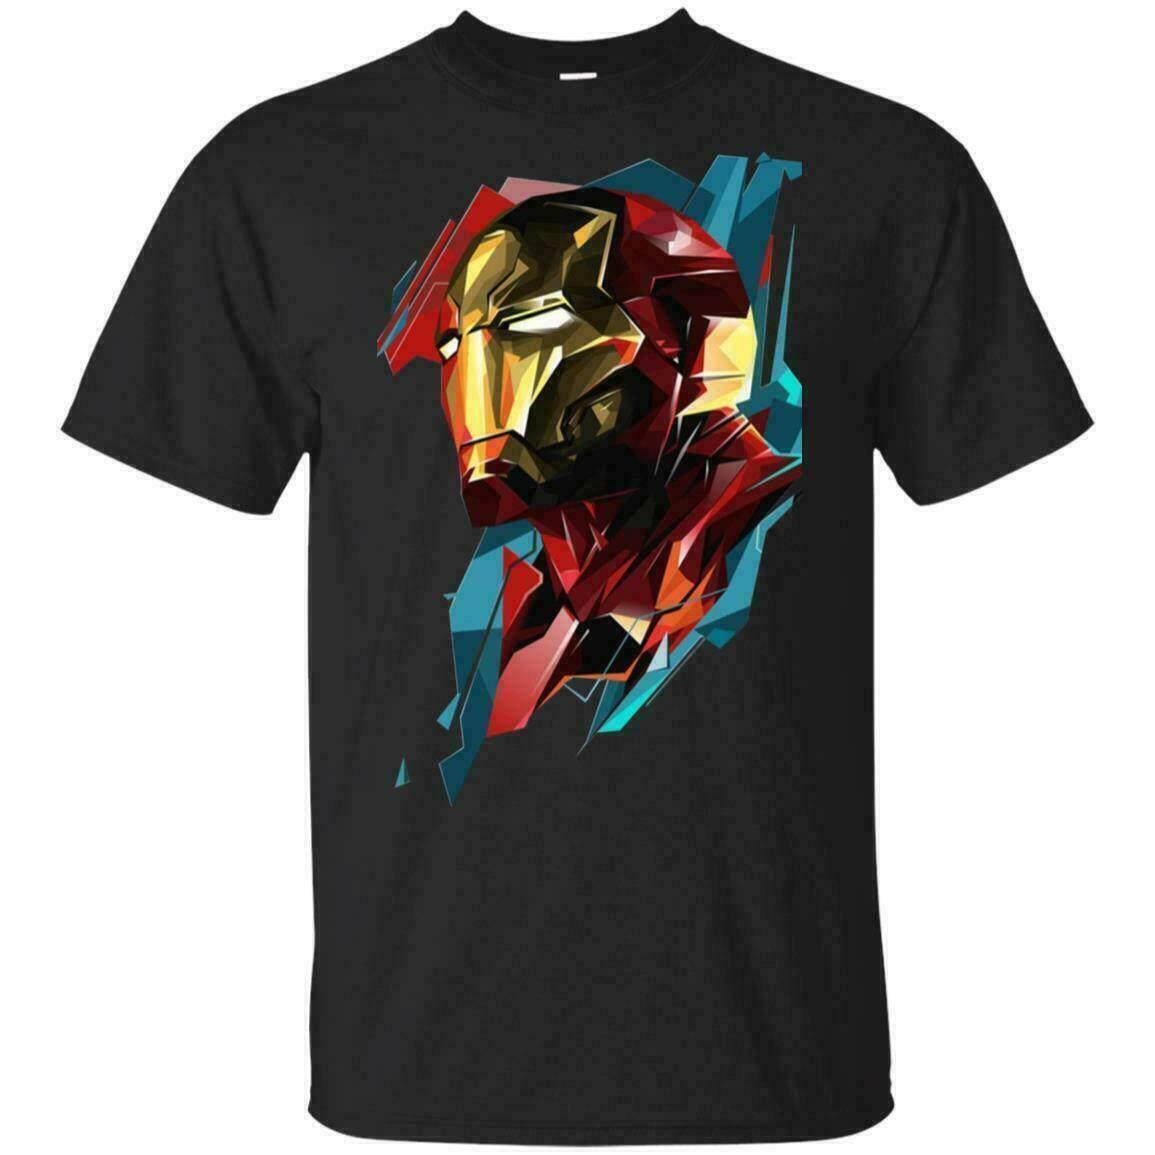 Sports t-shirt Iron Man Marvel T-Shirt Avenger 4 End Game Iron Man